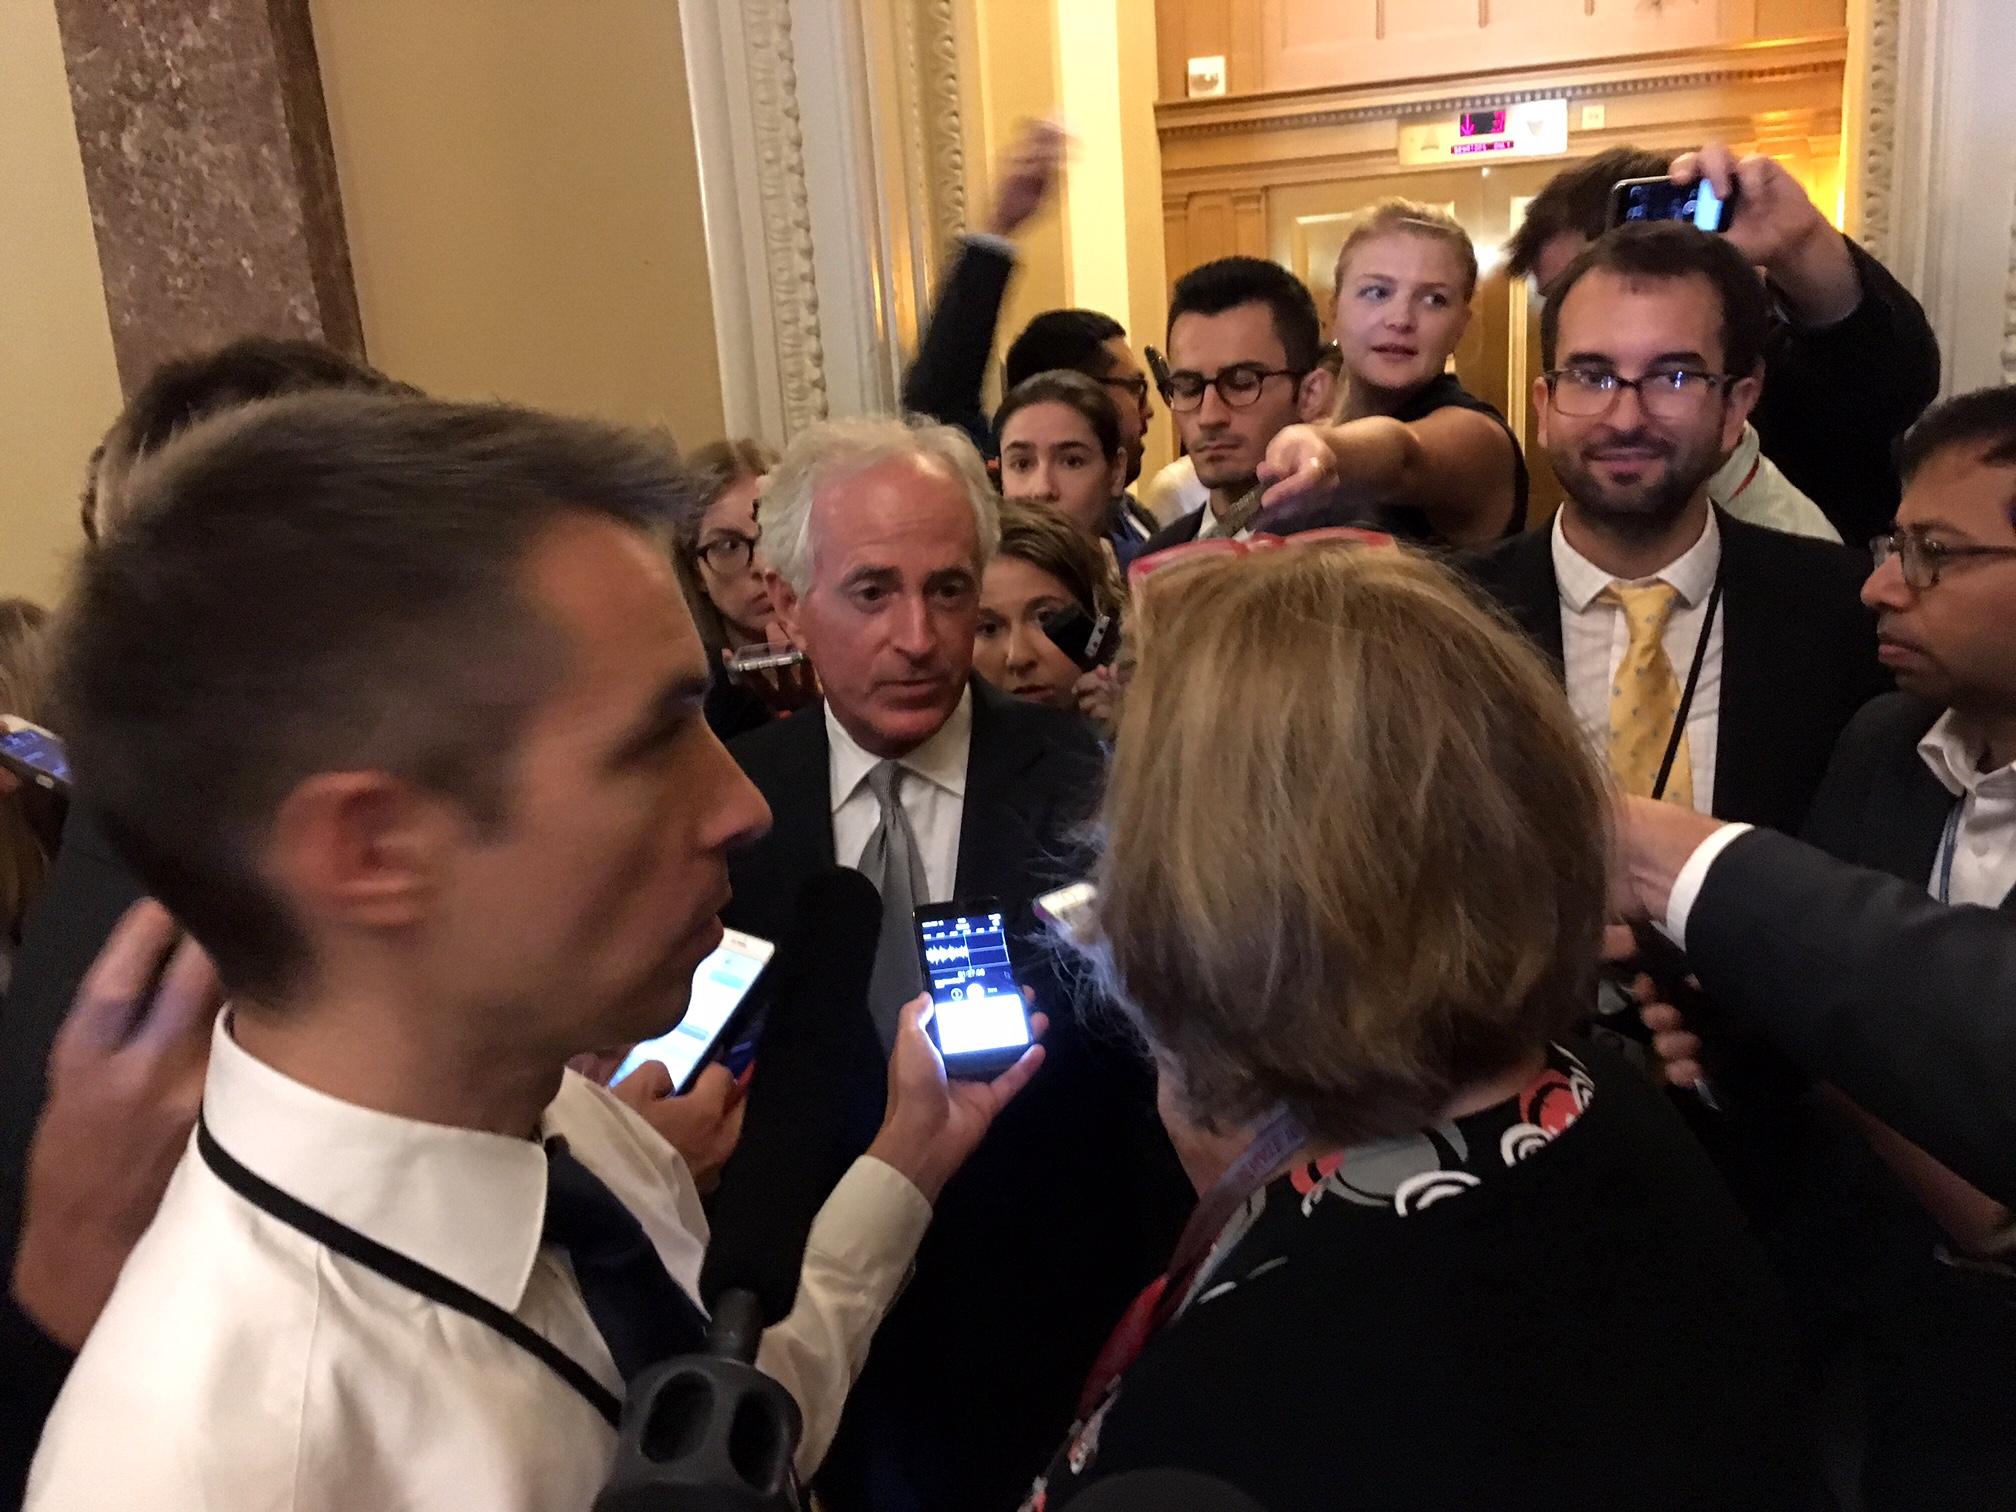 U.S. Sen. Bob Corker, R-Tennessee, at the center of one media scrum outside the Senate chamber. (Photo by Liz Ruskin/Alaska Public Media)